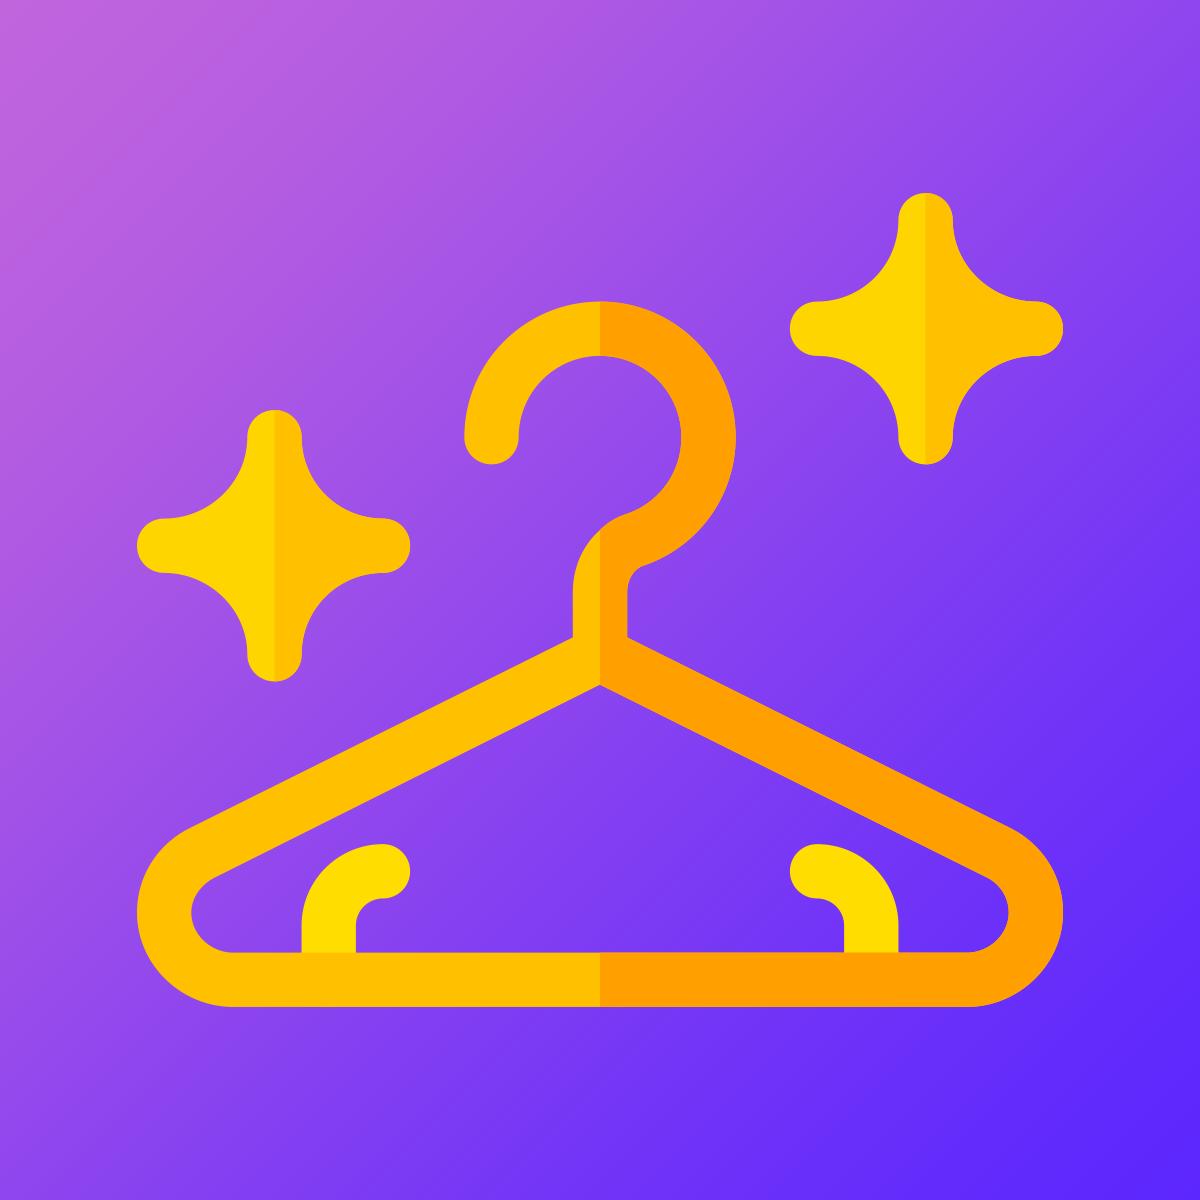 Shopify Lookbook app by Auraapps